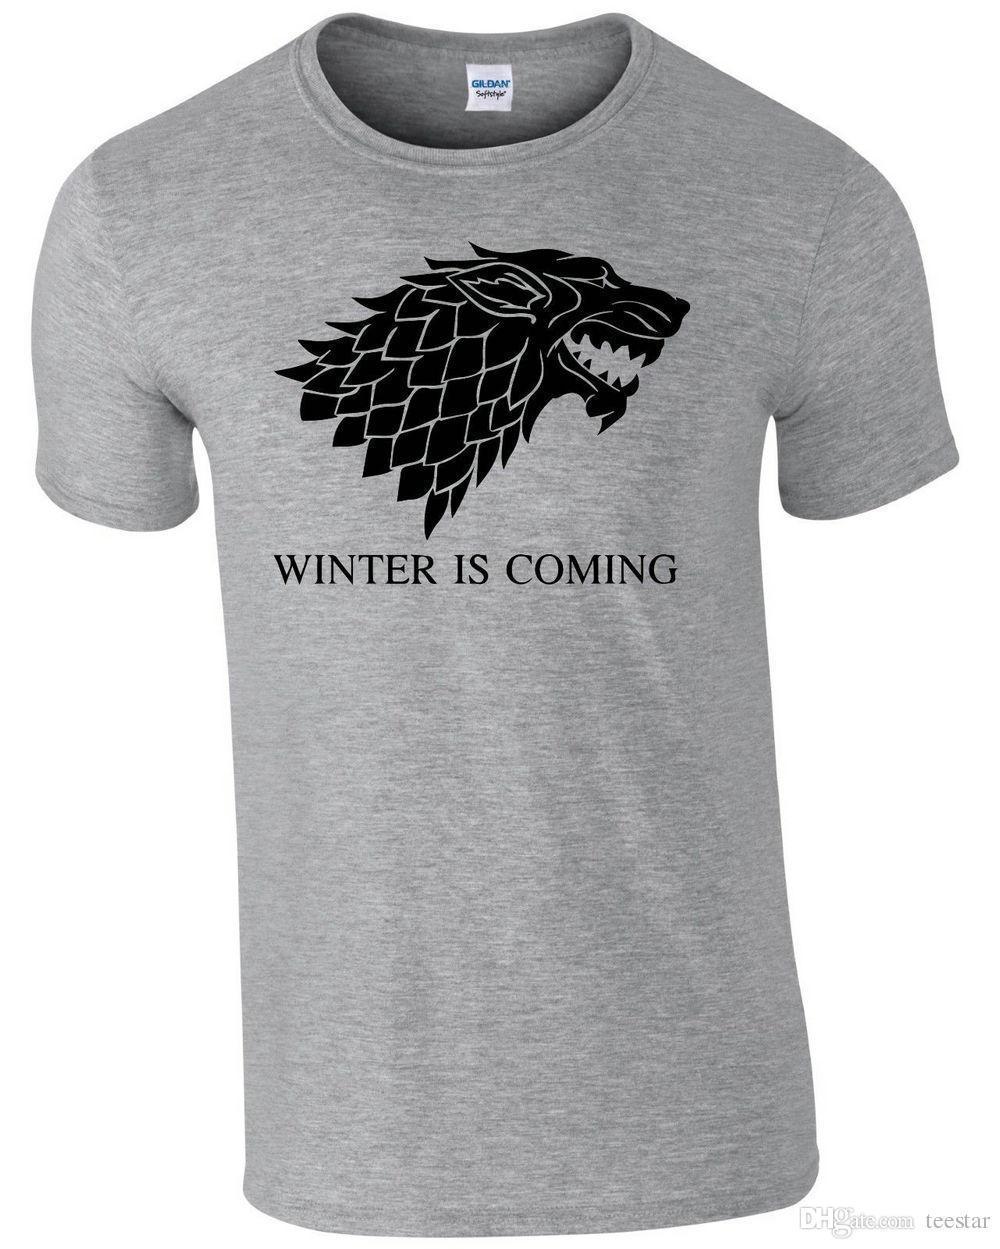 8c646a6a197 Cheap Shirt T-shirt For Men Design Custom Short Sleeve Plus Size Party T  Shirts Winter Is Coming Mens Tee T-Shirt Men O-Neck Tee Shirt